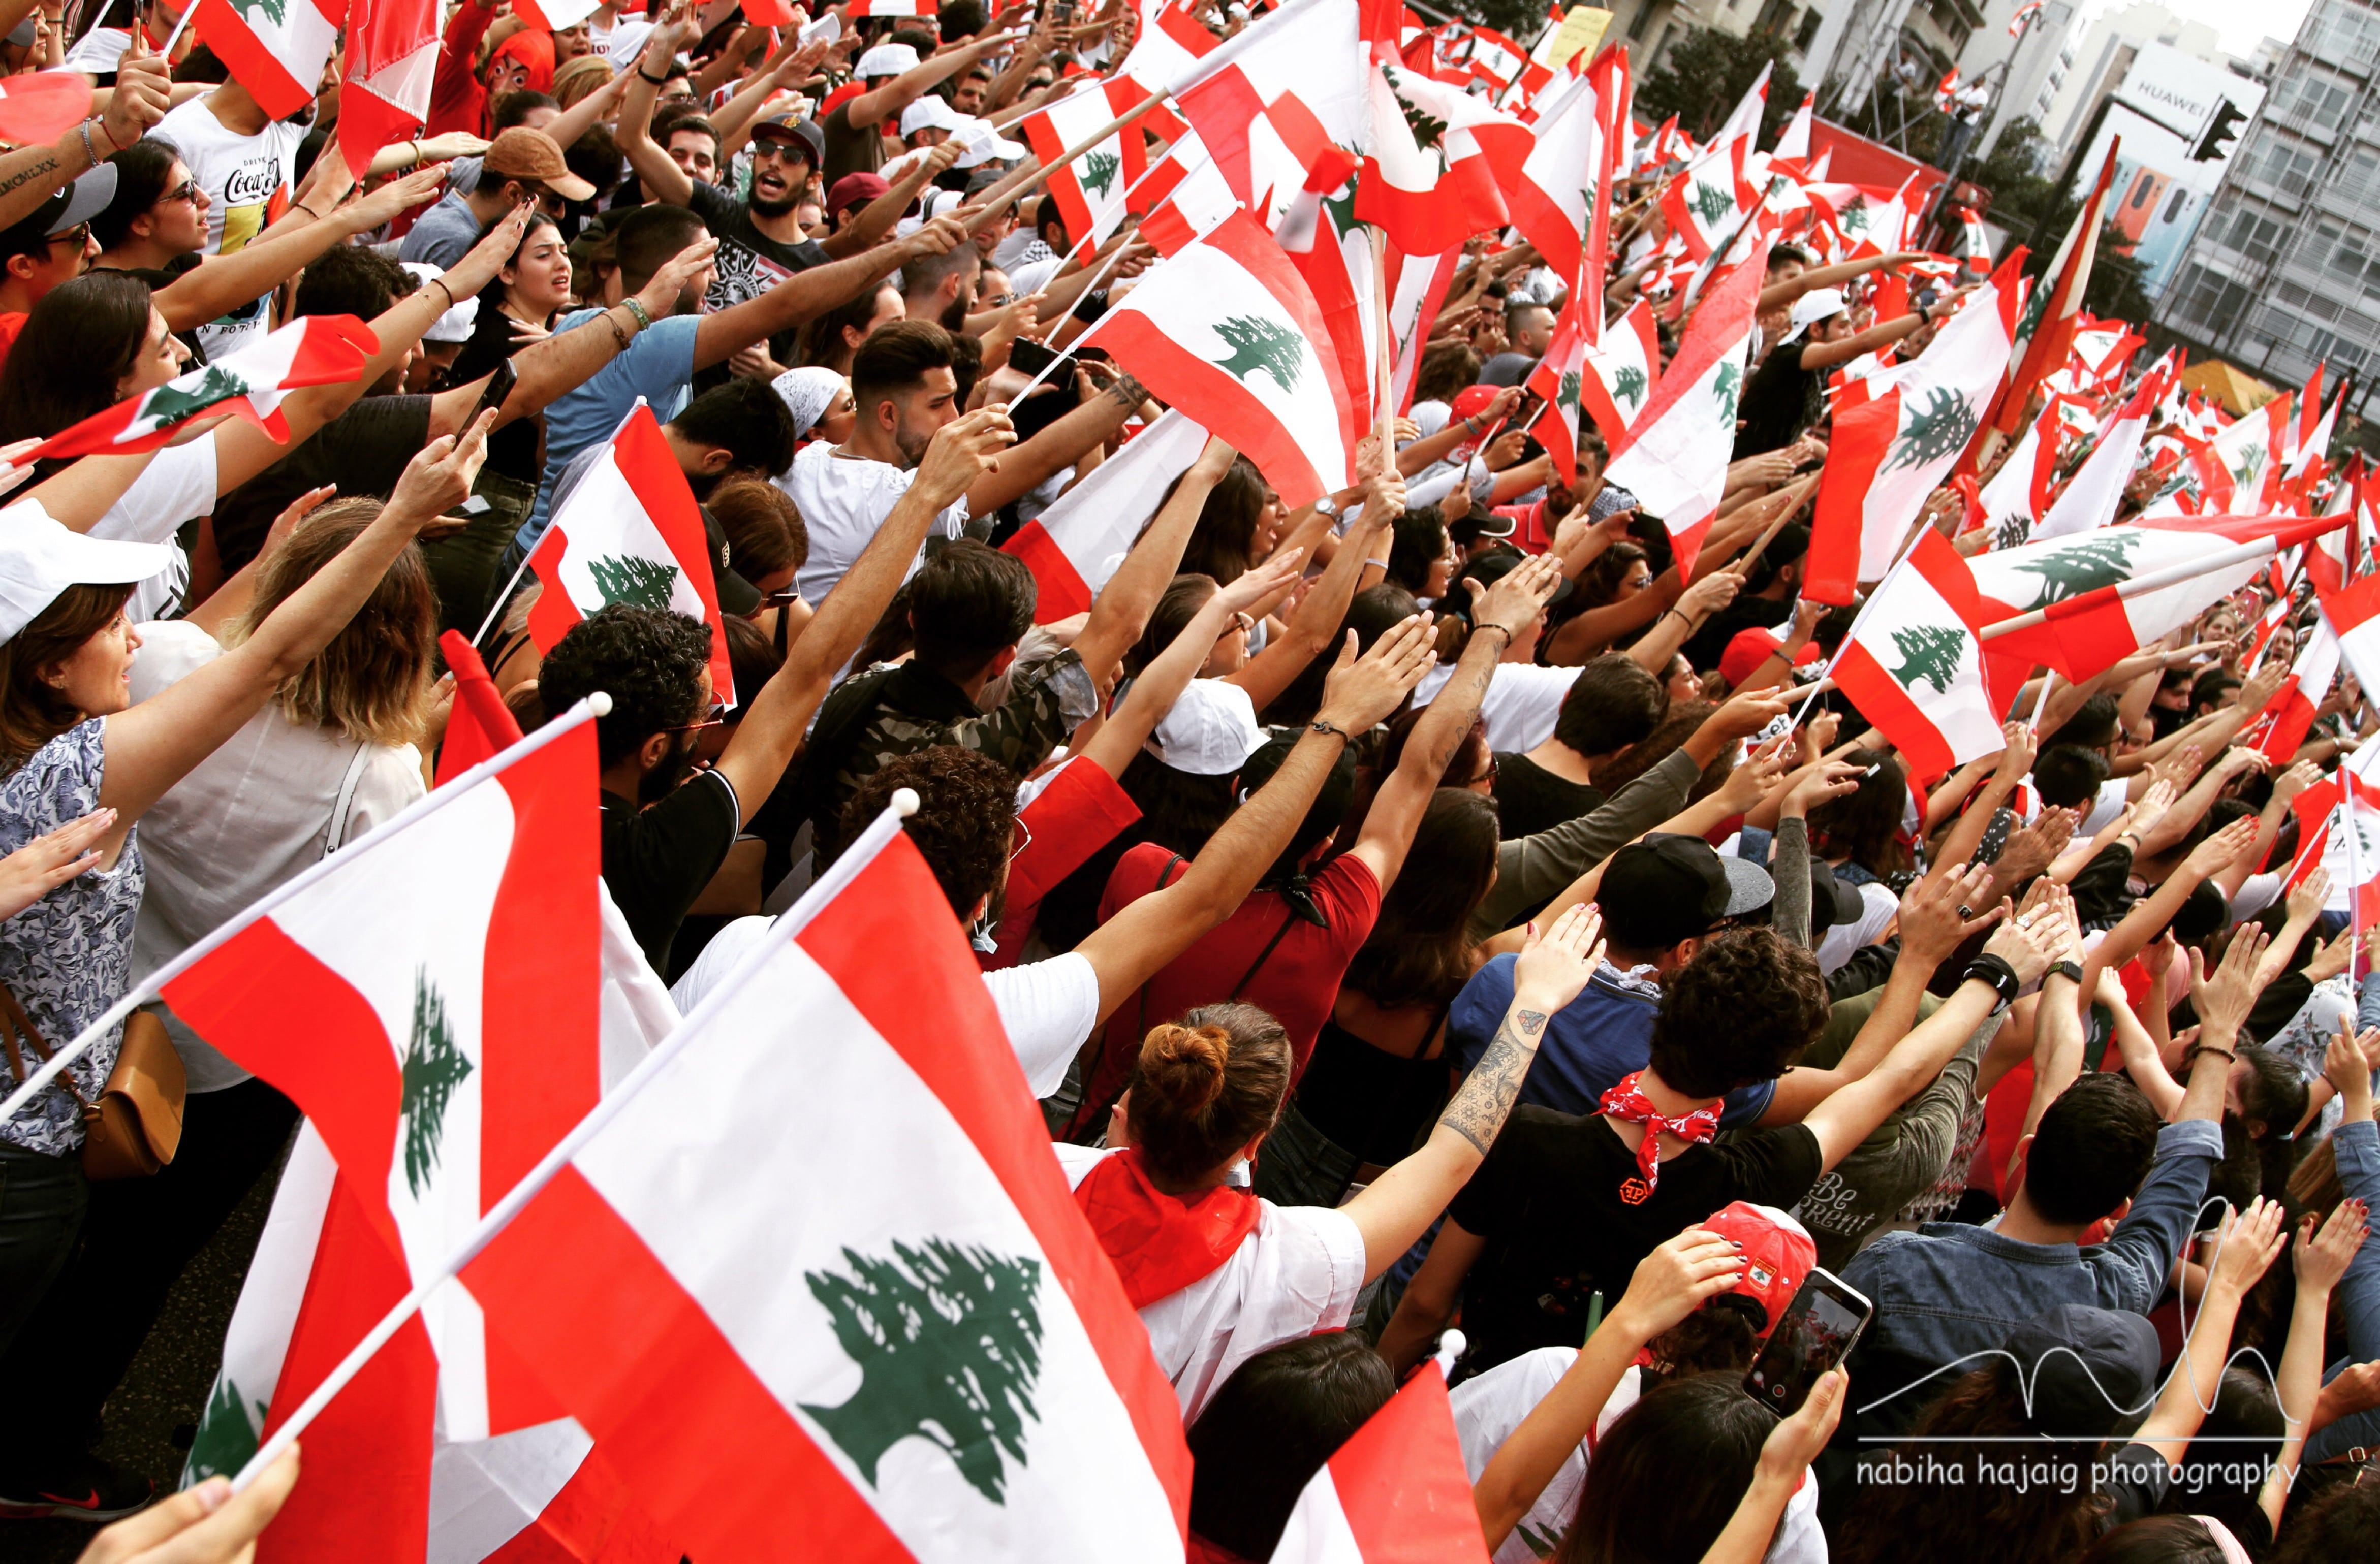 Proteste del 2019 a Beirut. Flickr/Nabiha Hajaig in licenza CC